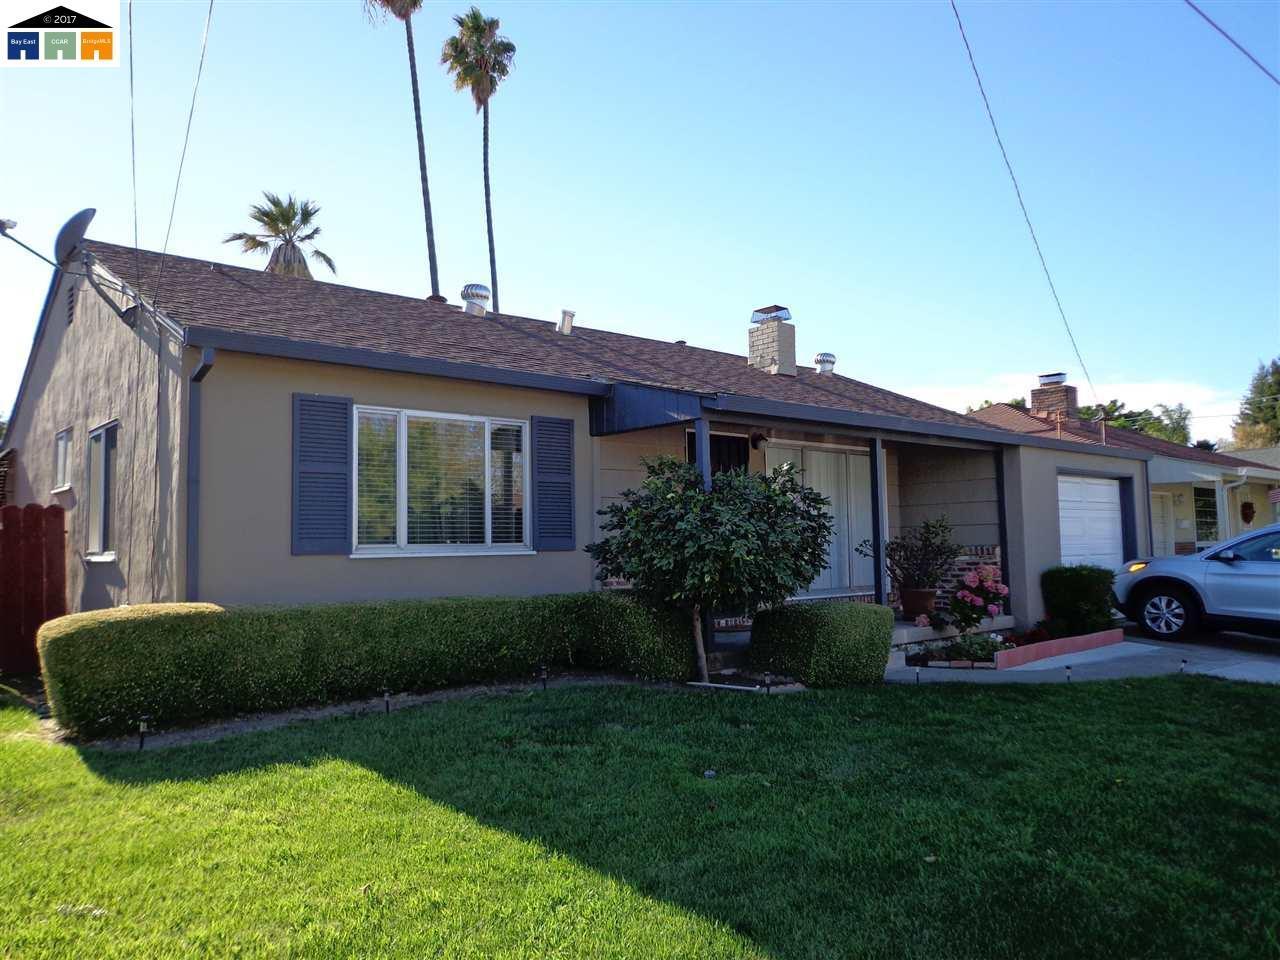 Single Family Home for Sale at 16019 Via Toledo 16019 Via Toledo San Lorenzo, California 94580 United States